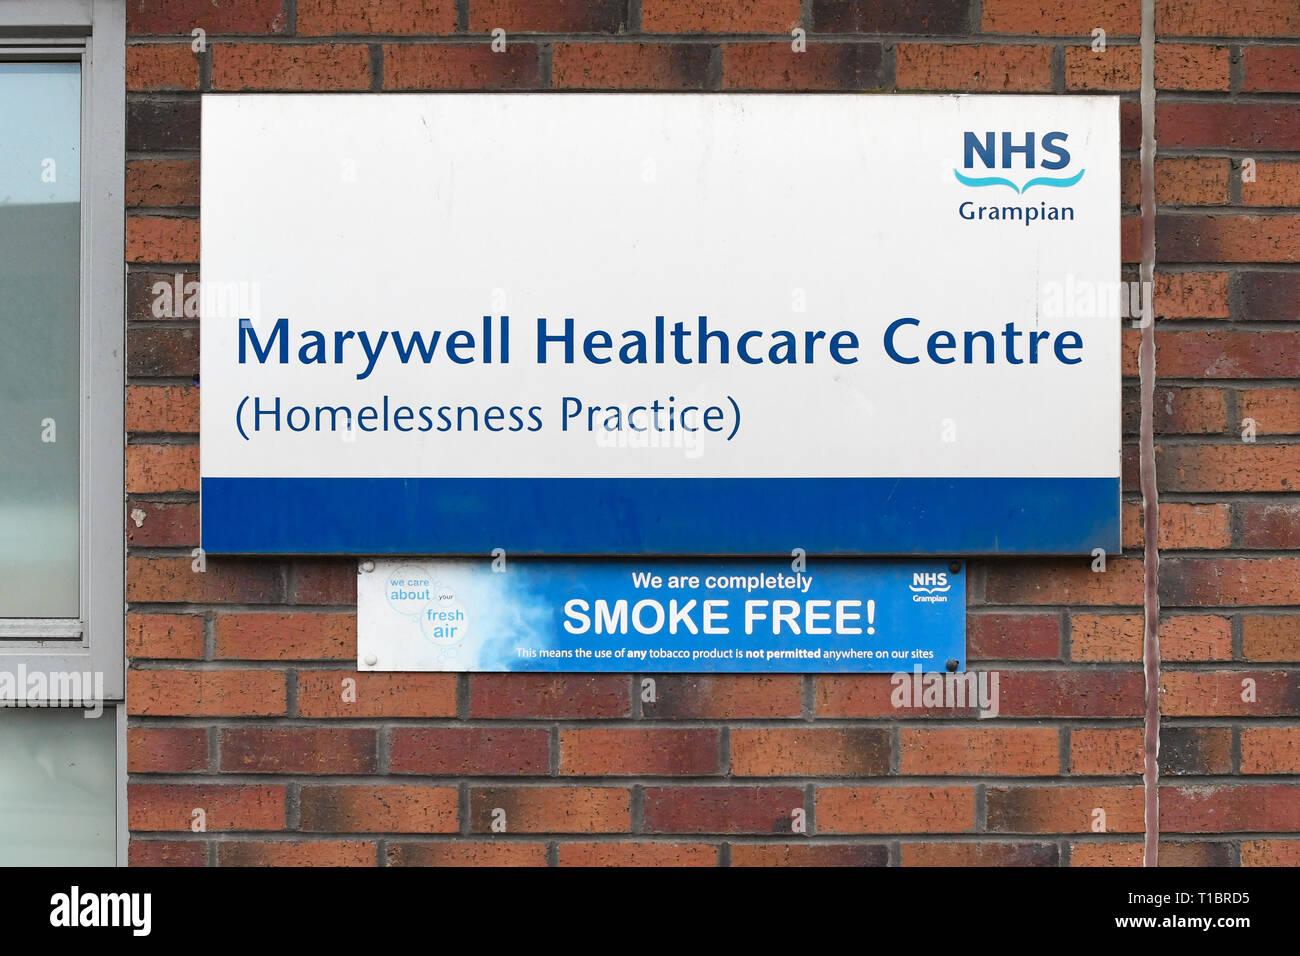 Marywell Heathcare Centre Homelessness Practice, Aberdeen, Scotland, UK Stock Photo